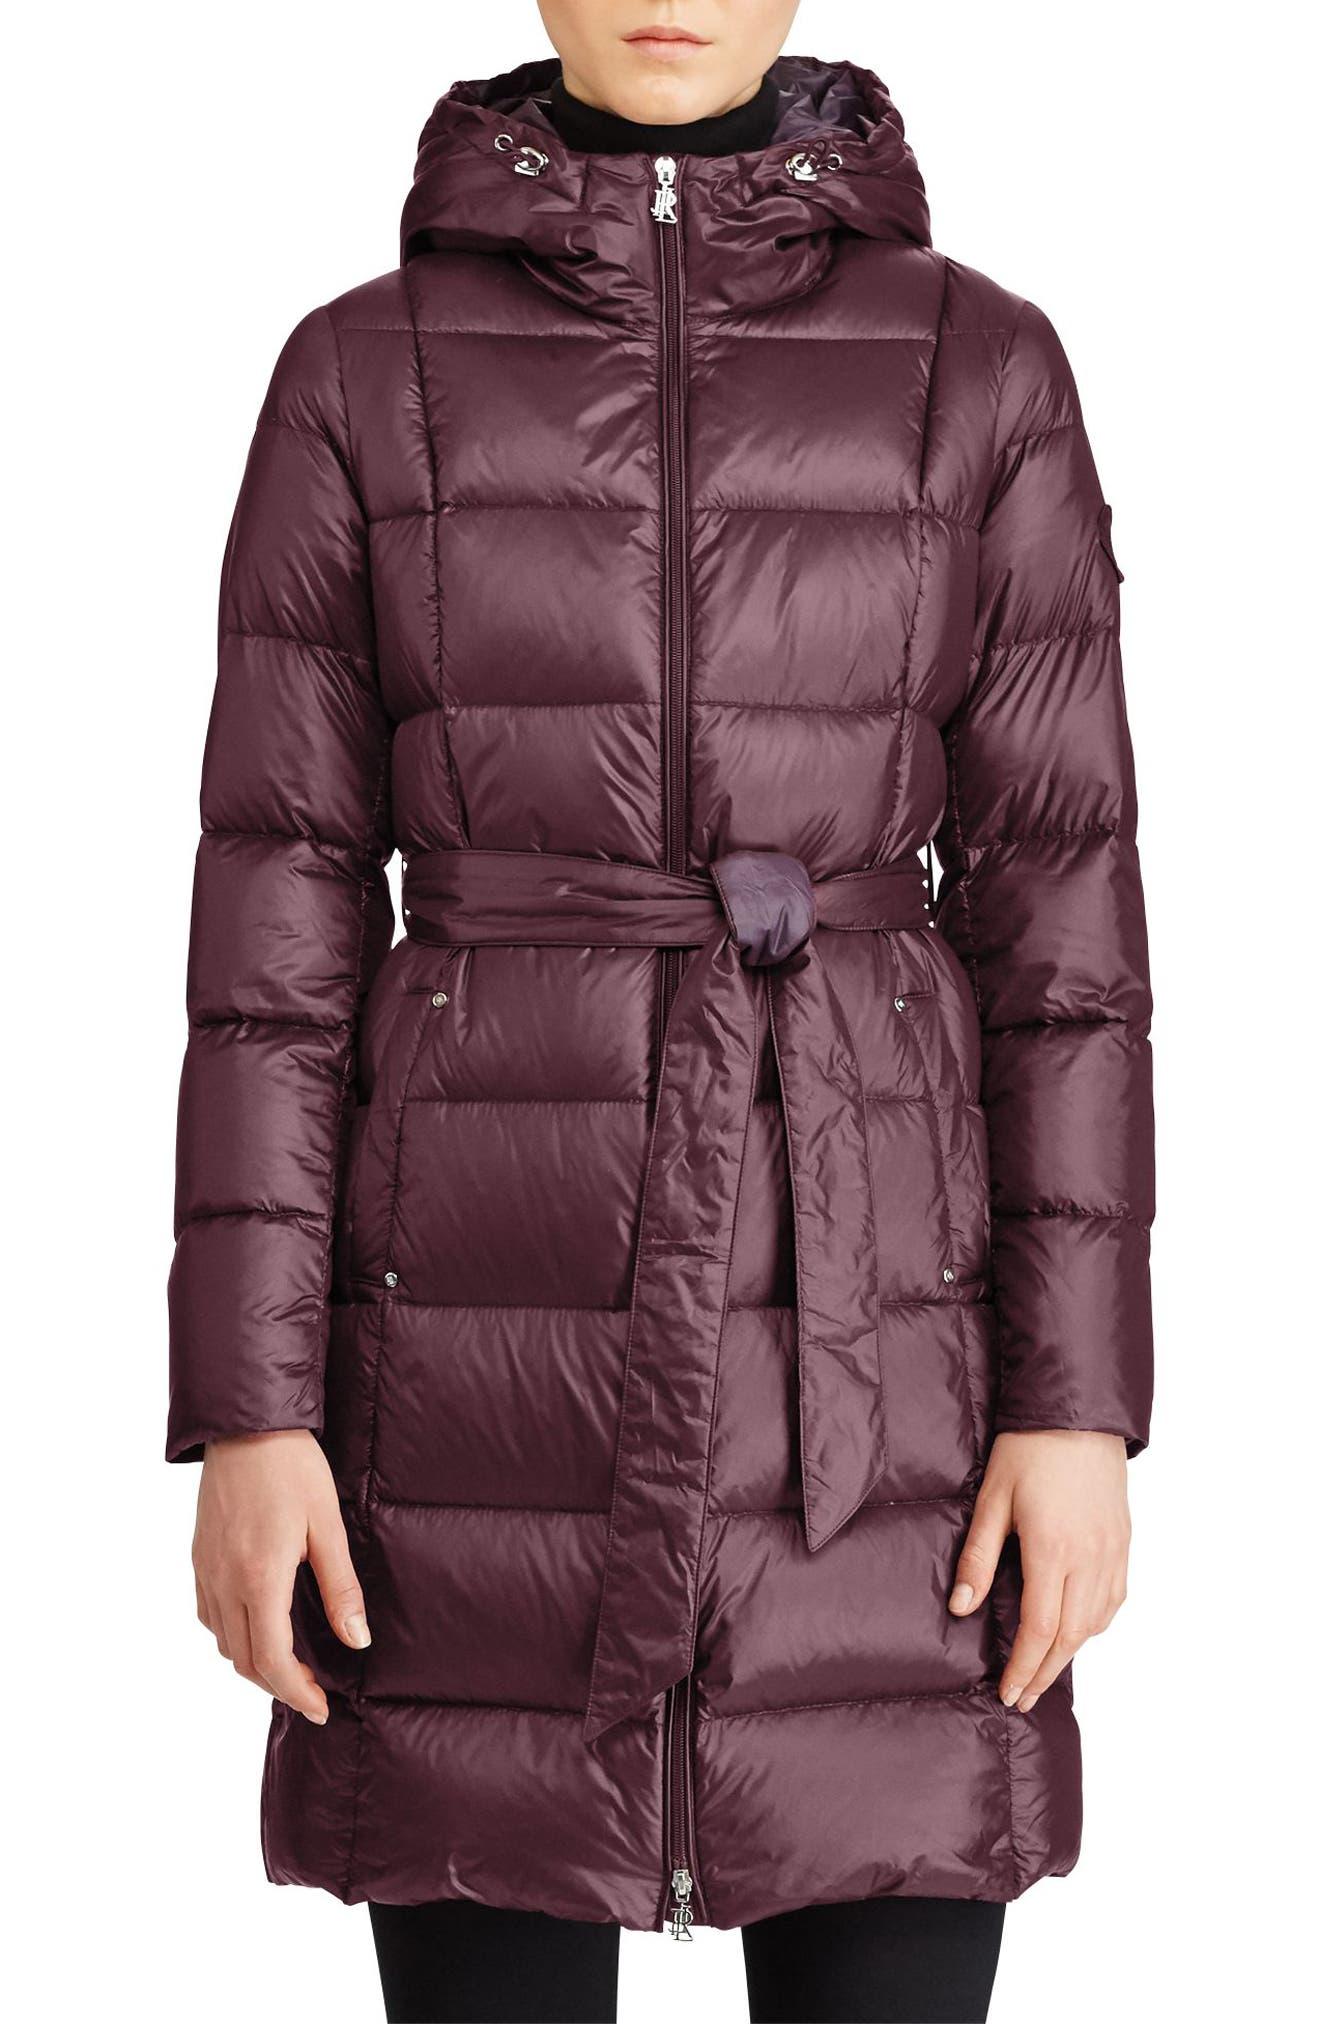 Packable Belted Down Jacket,                         Main,                         color, Burgundy/ Aubergine